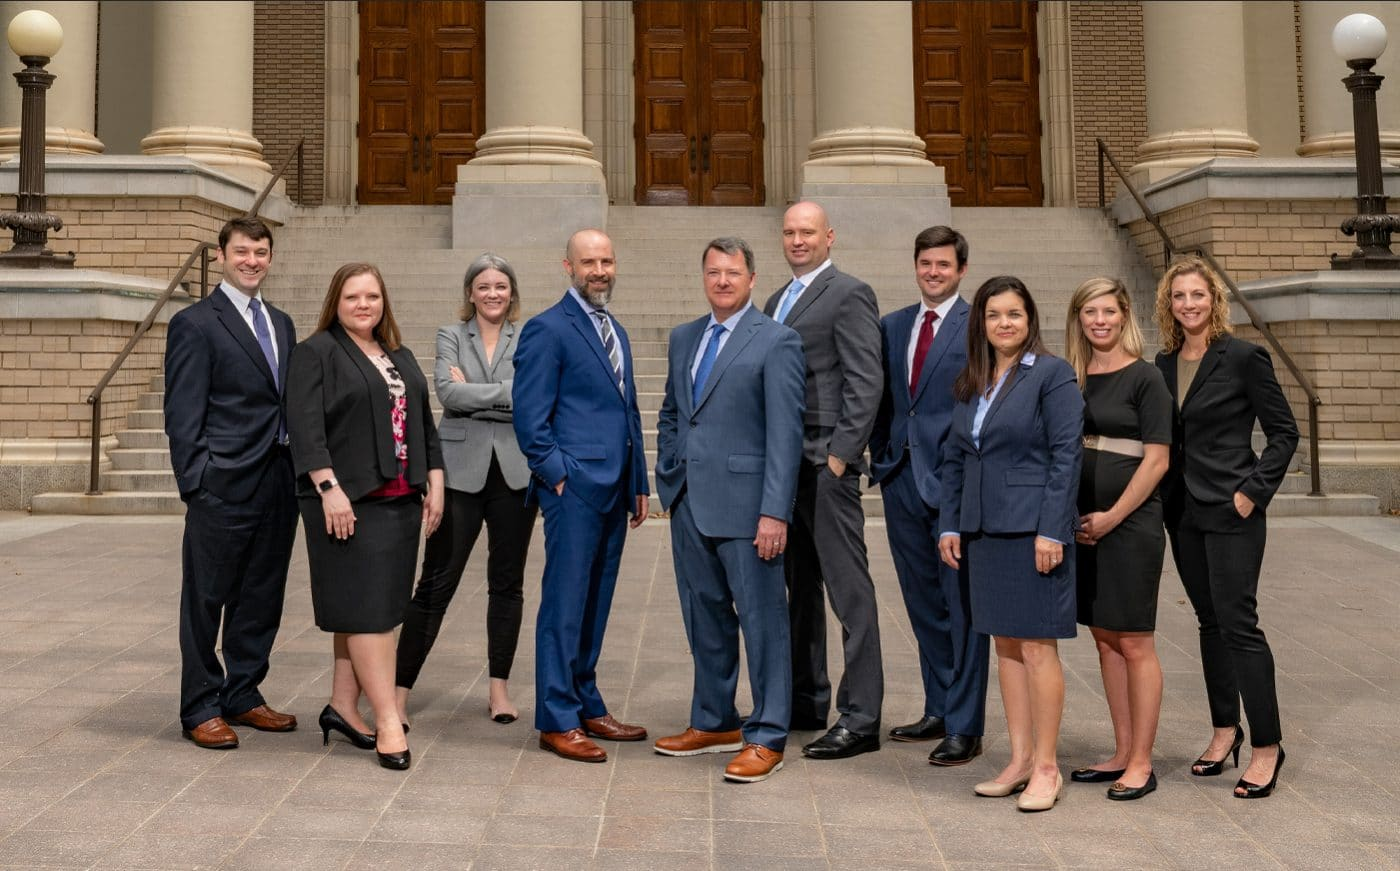 Personal Injury Lawyers Savannah, GA